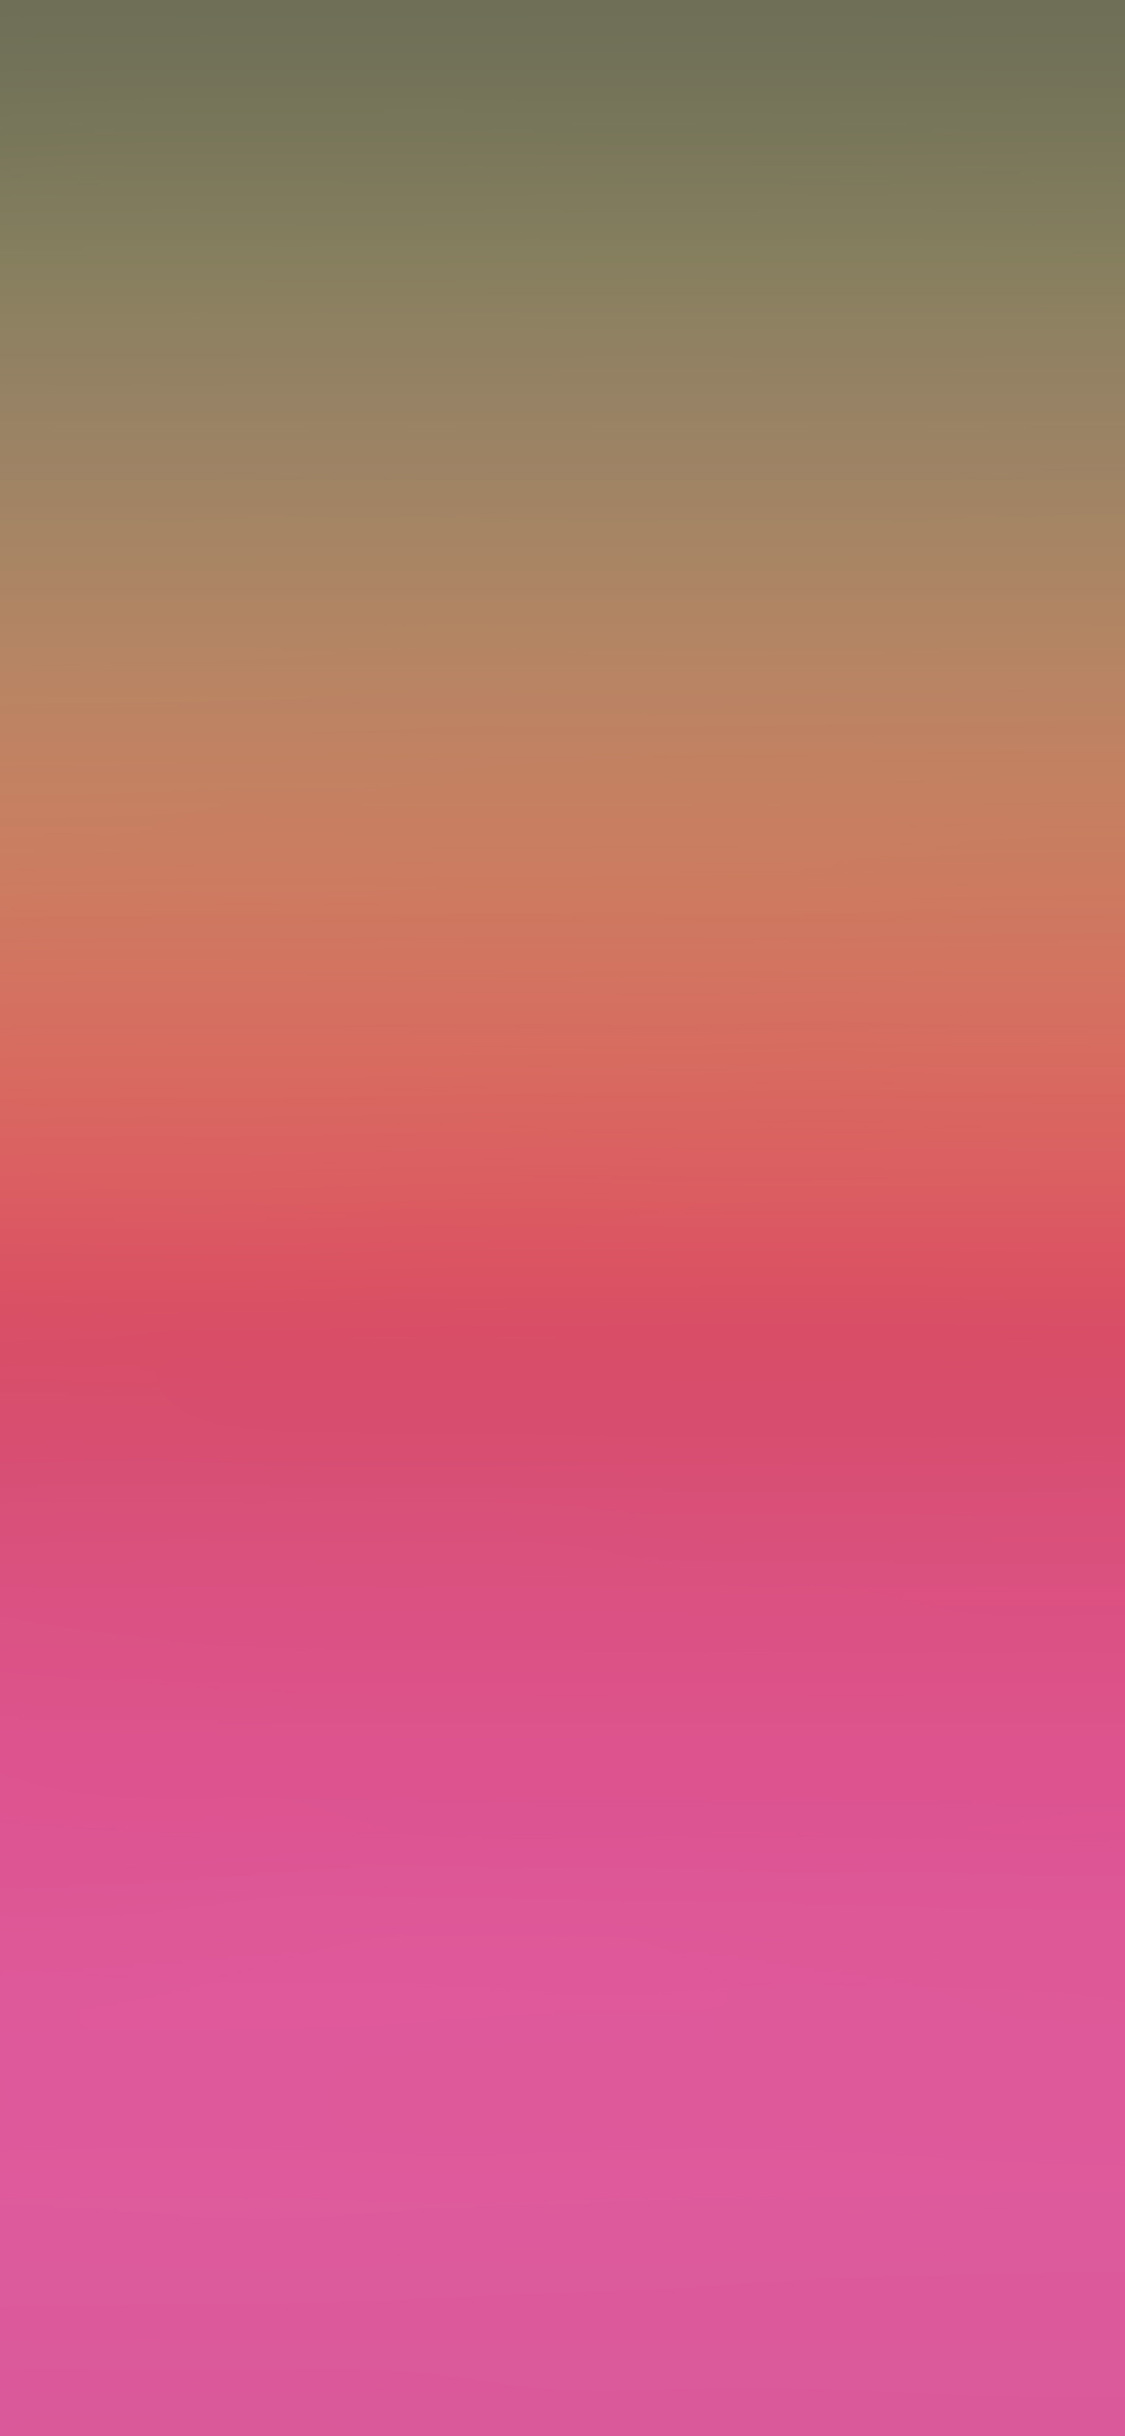 iPhoneXpapers.com-Apple-iPhone-wallpaper-sl00-pink-blossom-blur-gradation